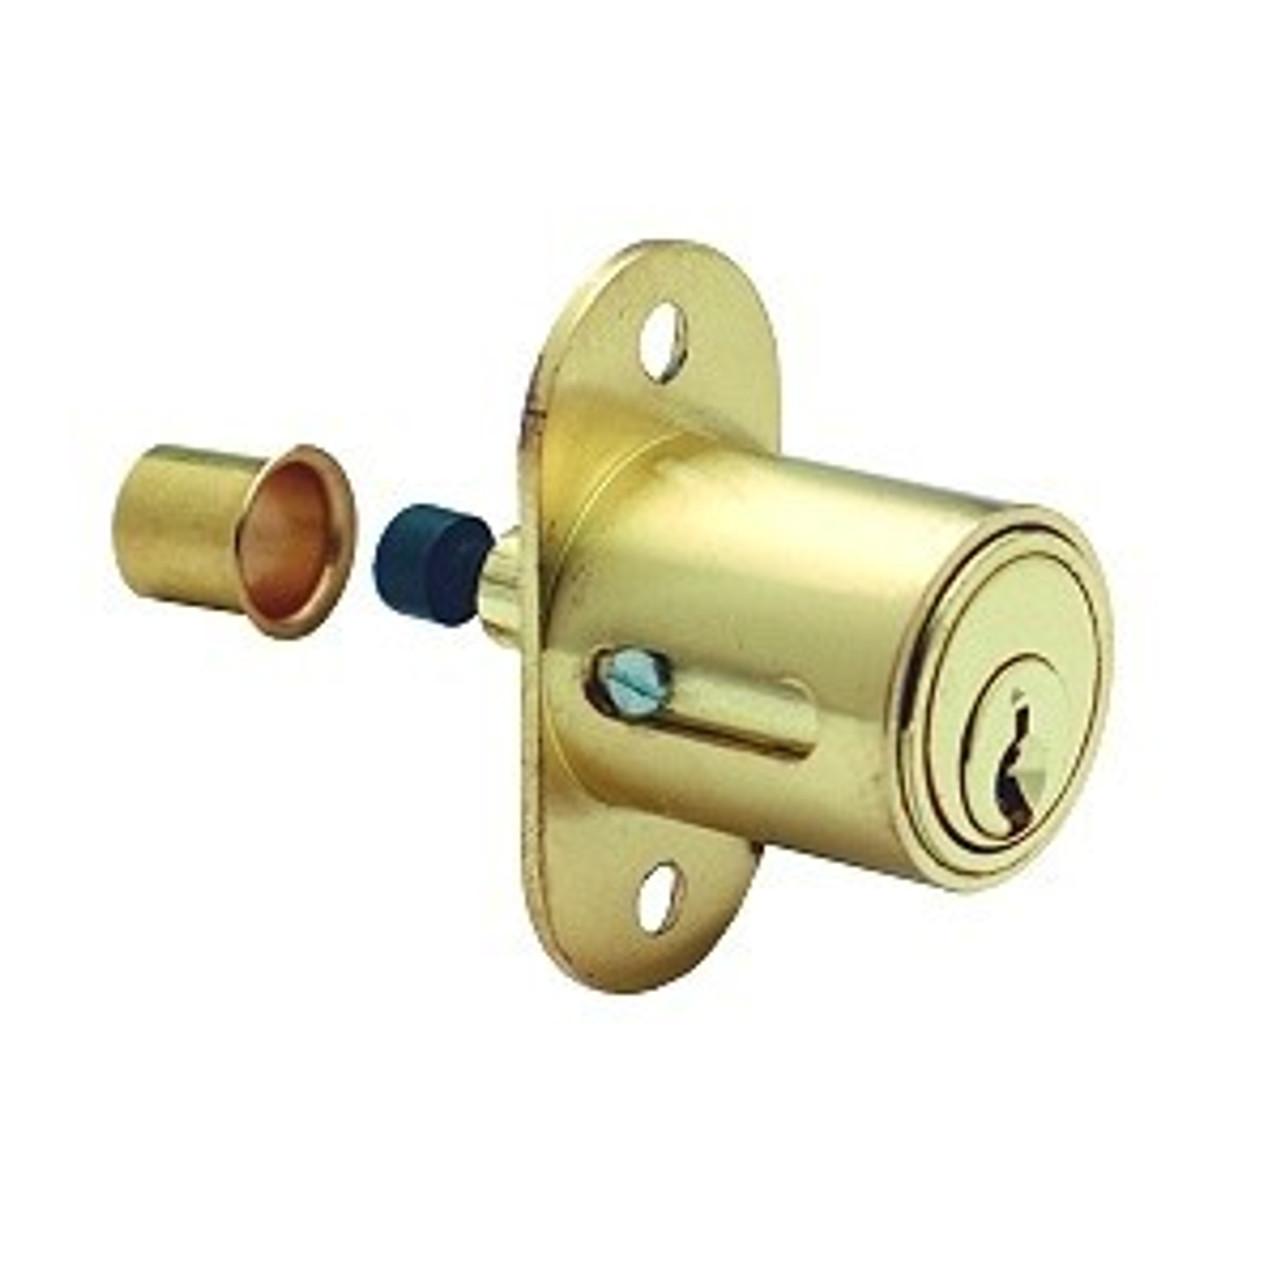 Push-in Plunger Locks